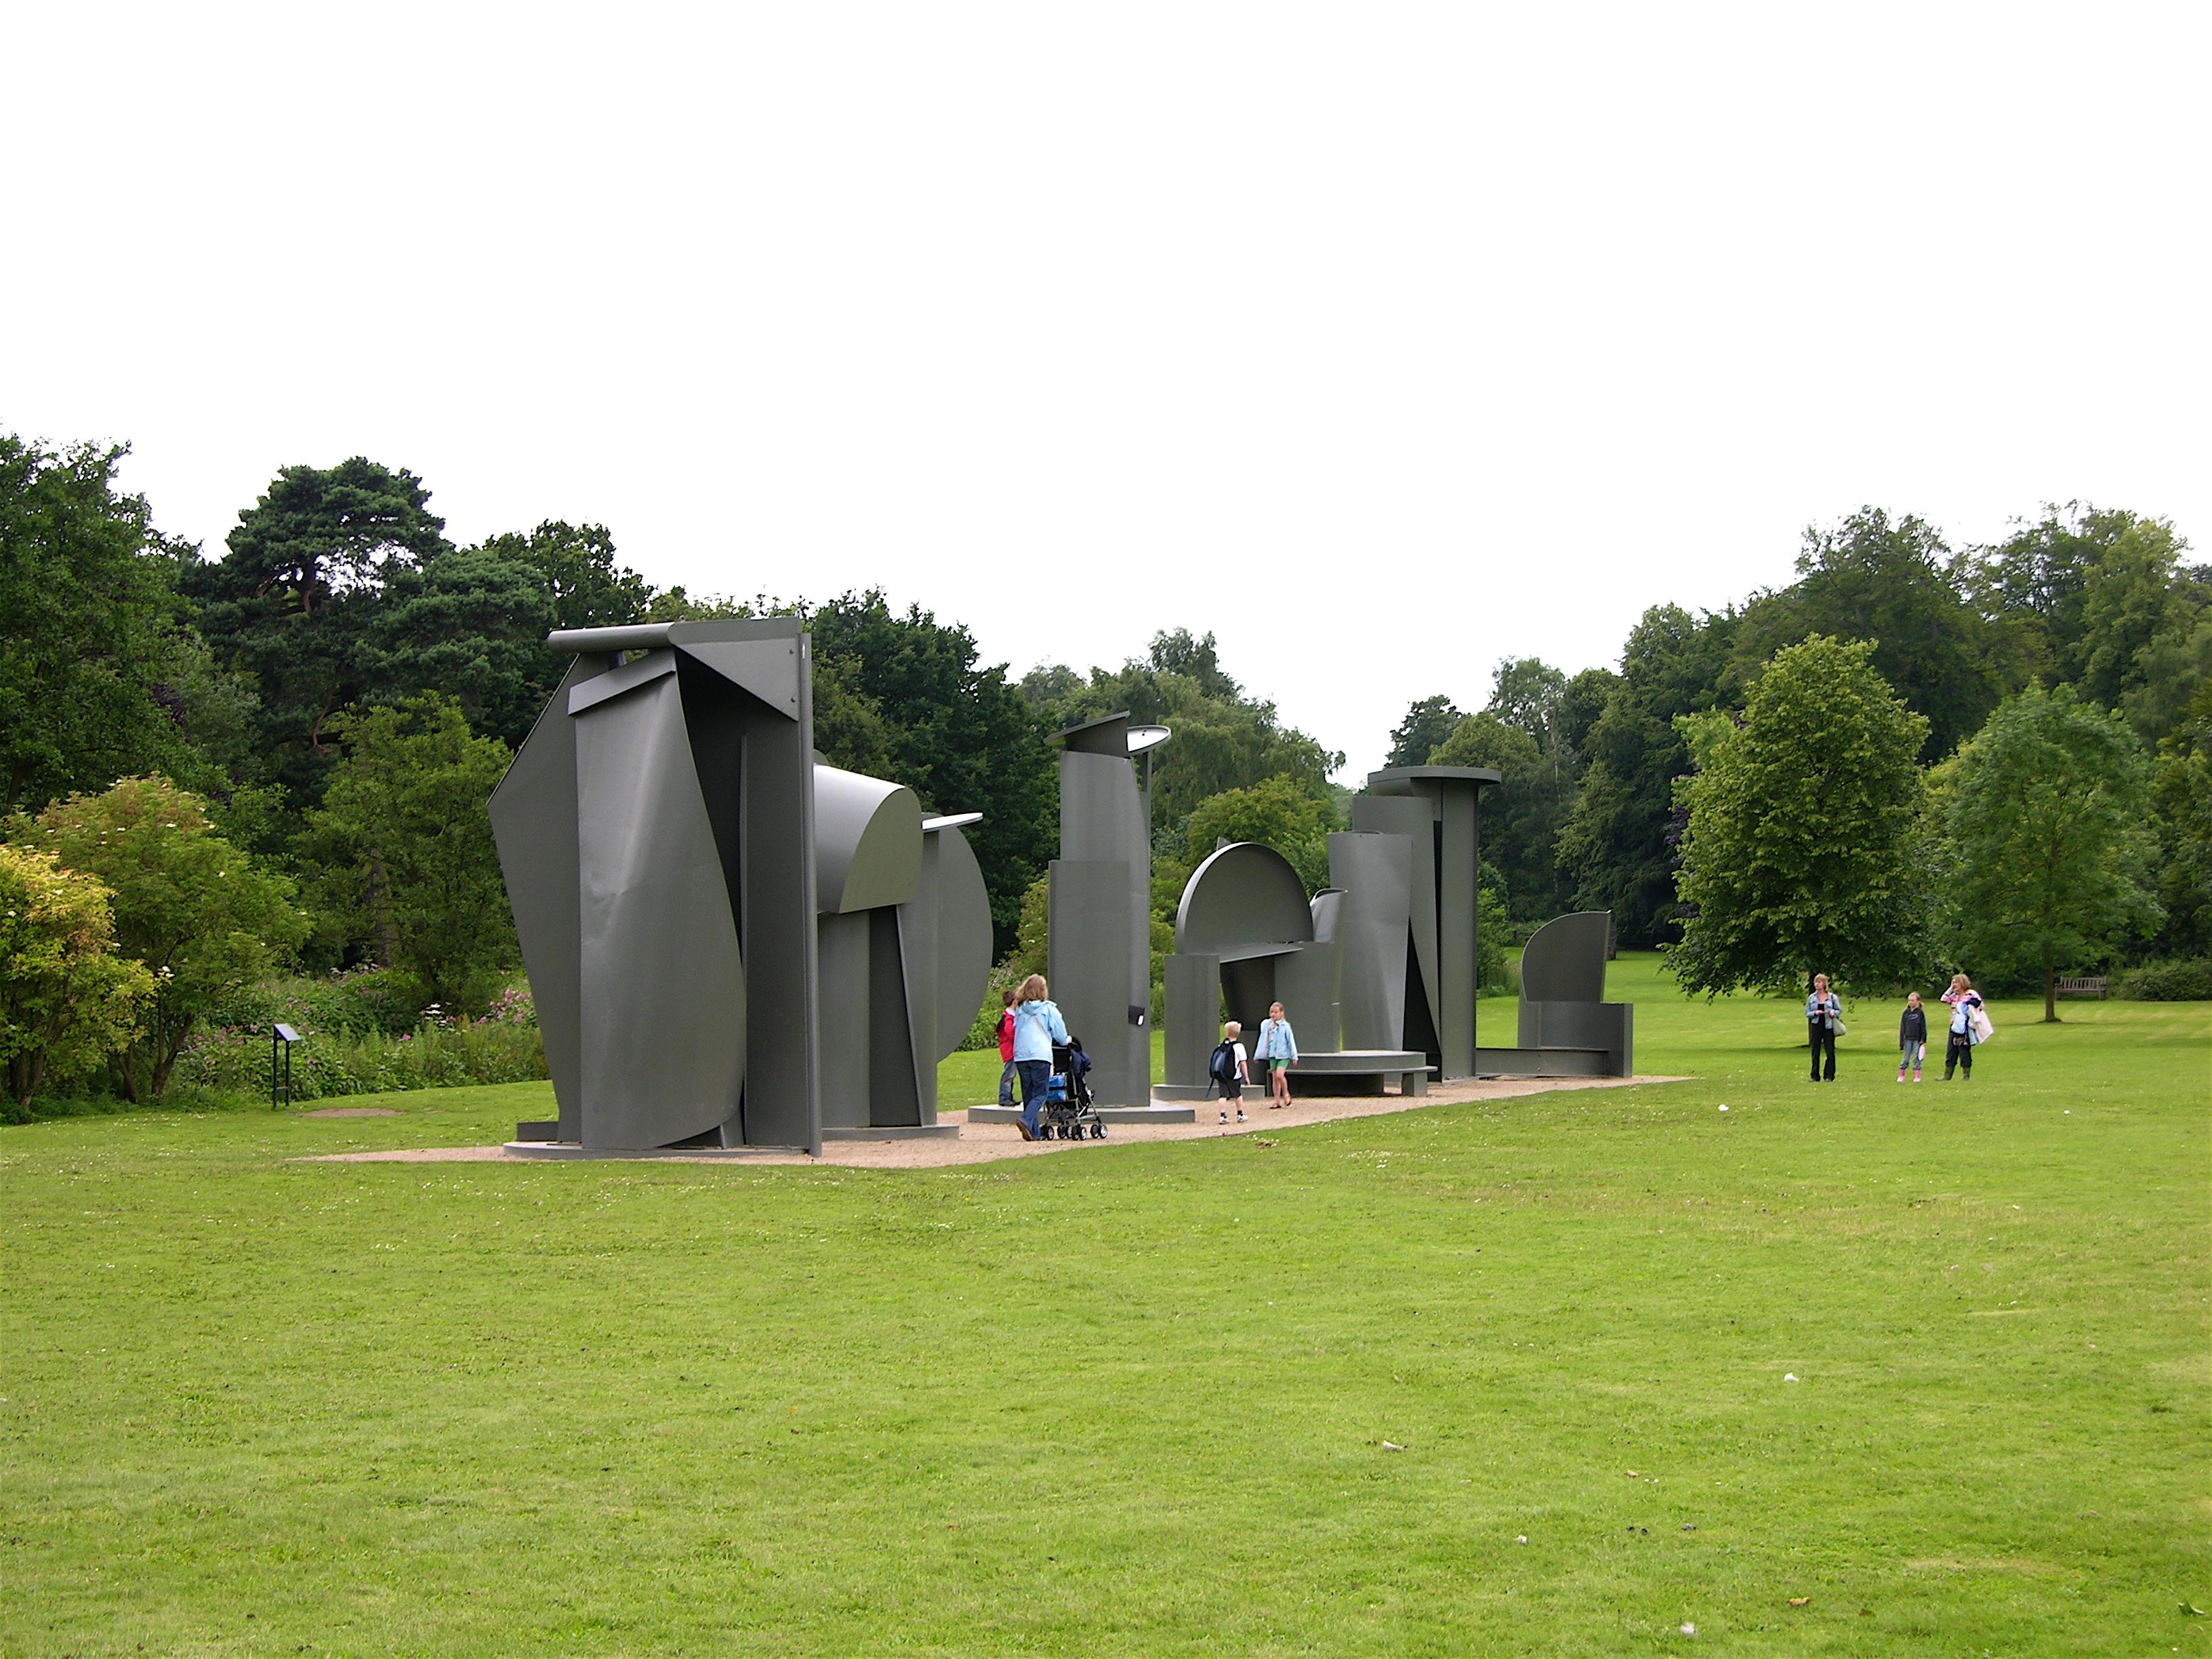 Sculpture park image library download File:Yorkshire Sculpture Park Caro Promenade.jpg - Wikimedia Commons image library download